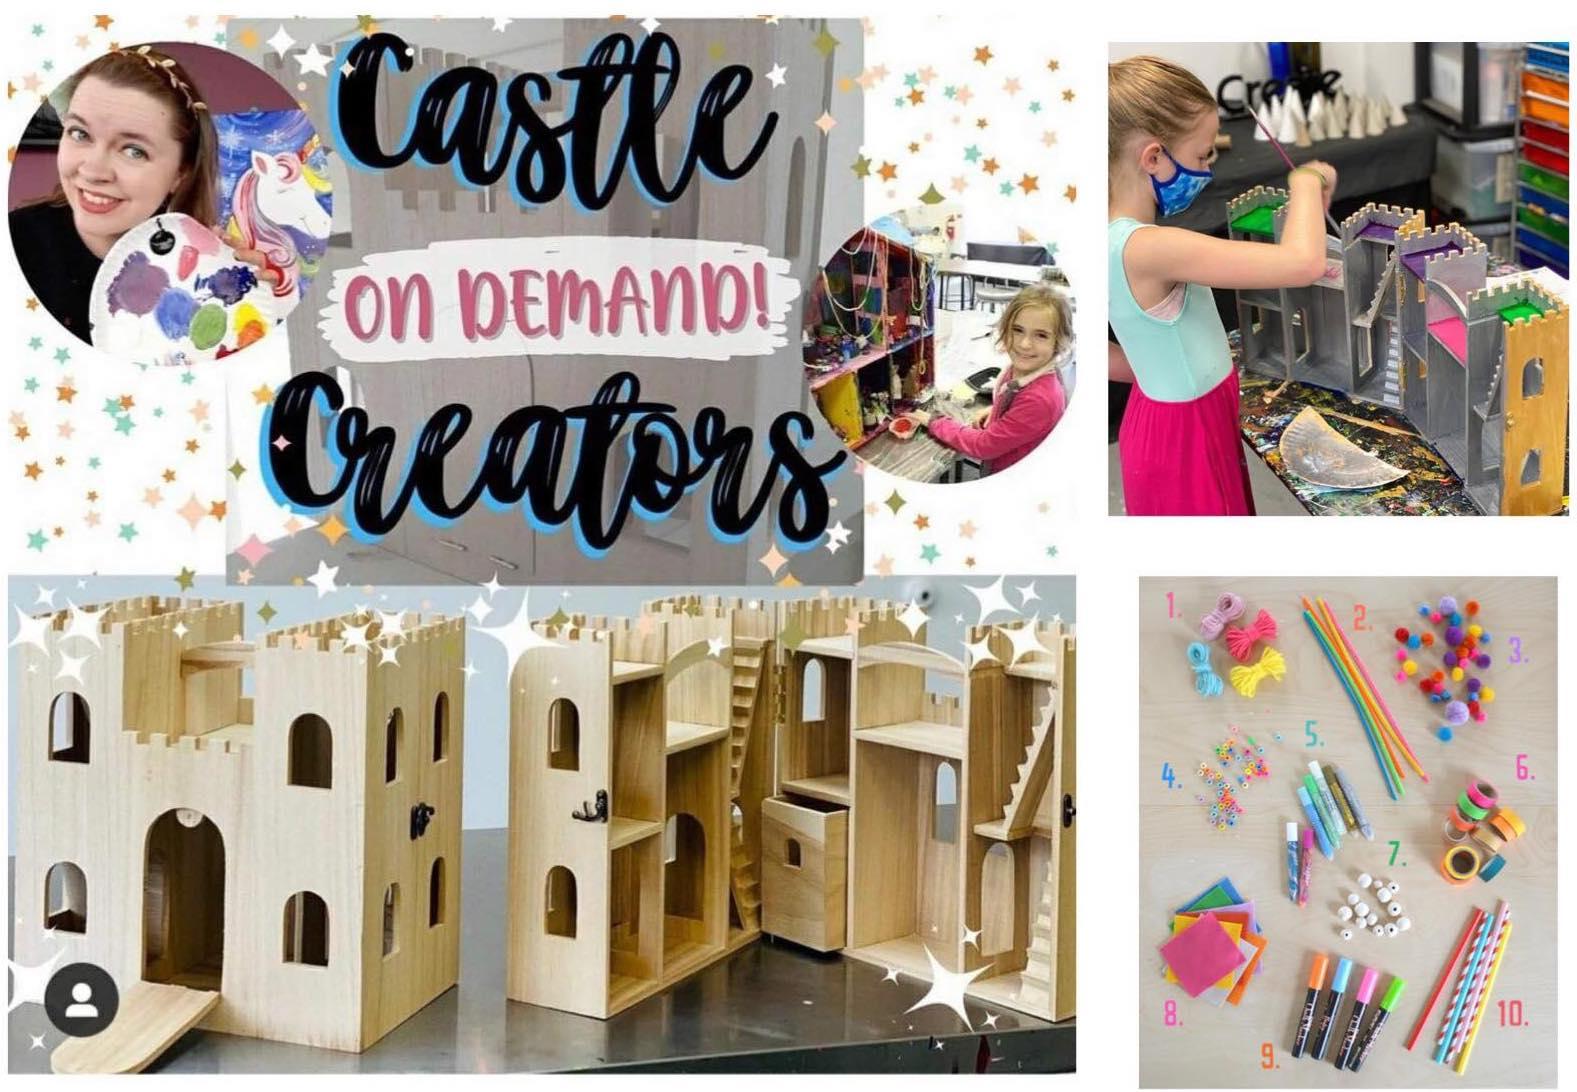 Castle Creators On-Demand Workshop and Kit